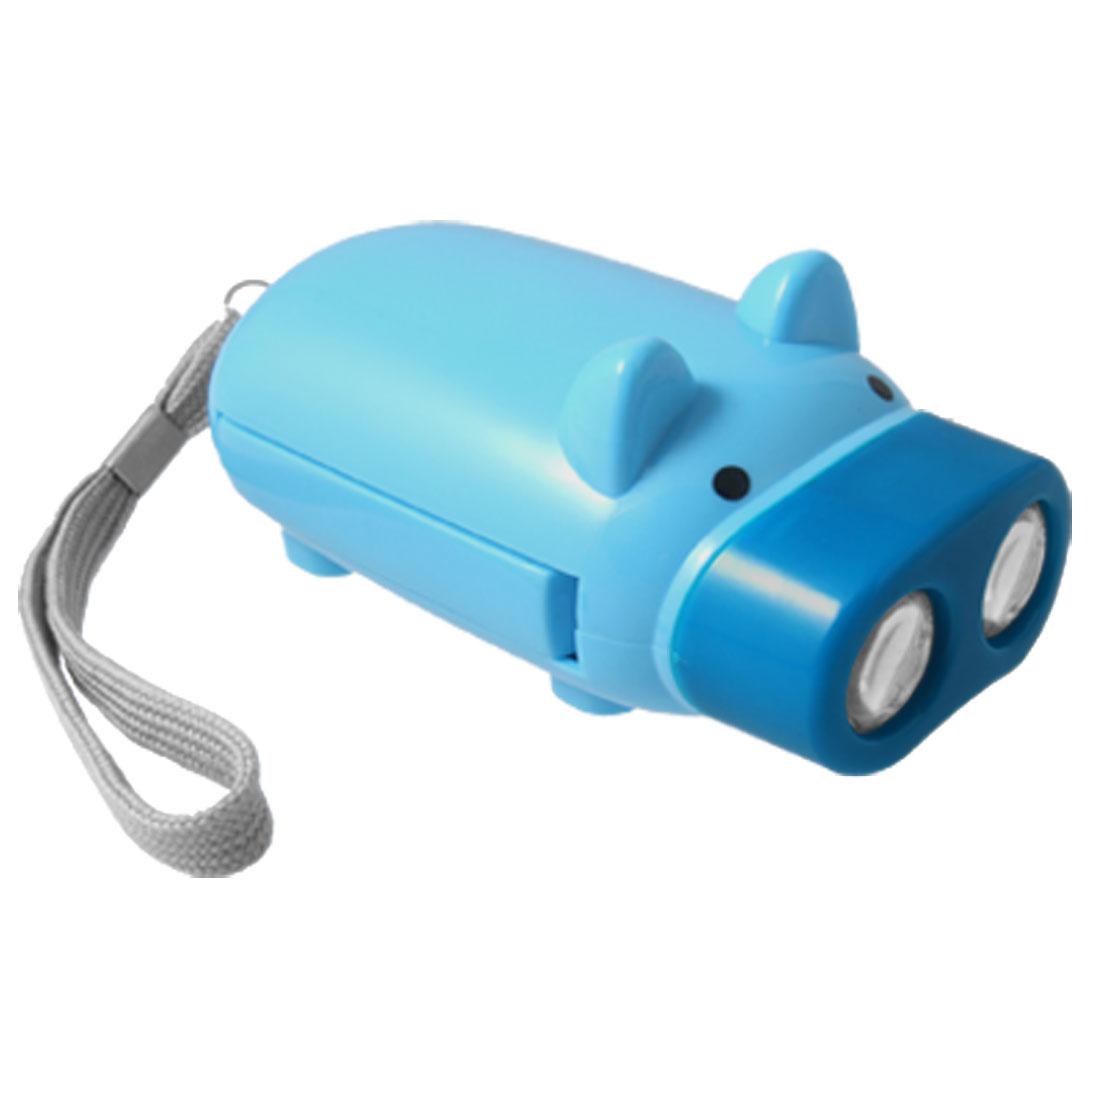 Sky Blue Pig Design Hand Crank Squeeze 2 LED Flashlignt Torch W Strap